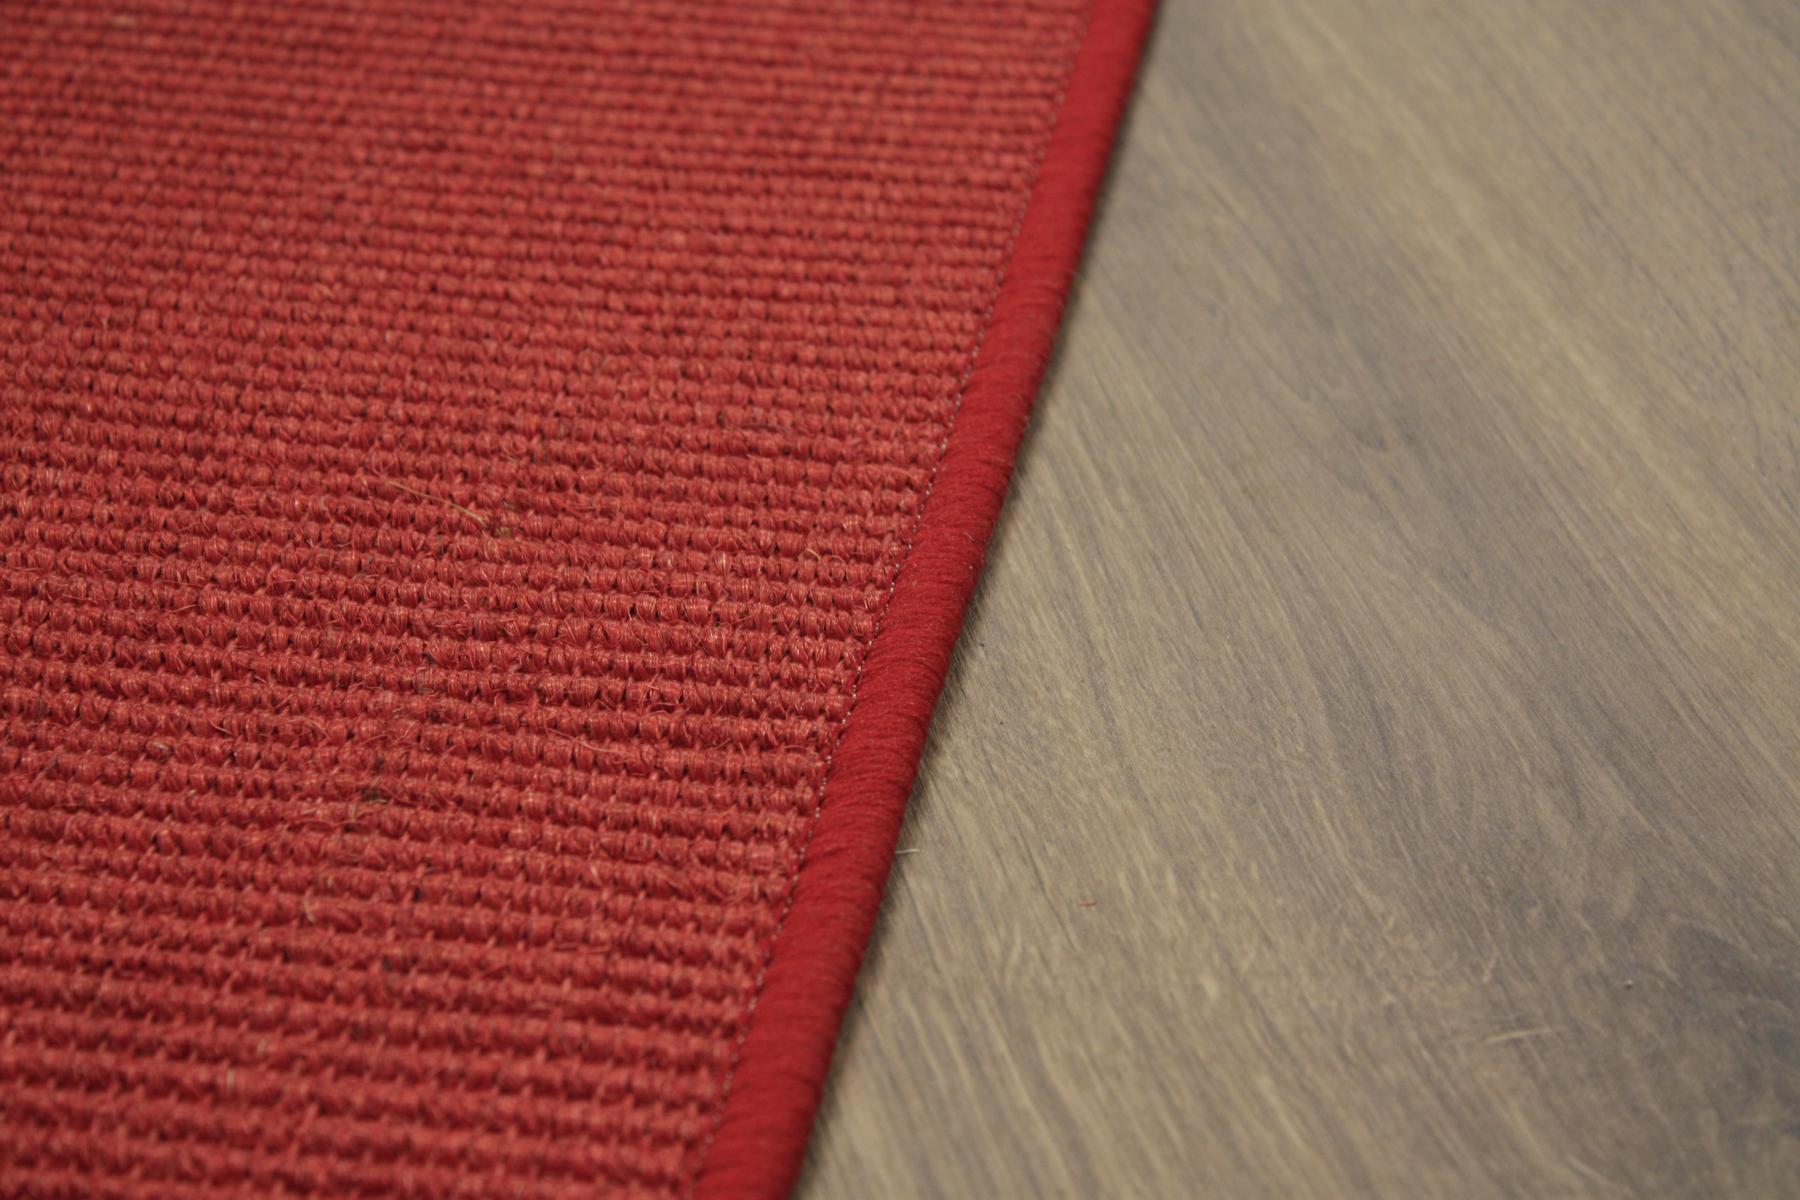 sisal teppich umkettelt rot 200x200cm 100 sisal gekettelt ebay. Black Bedroom Furniture Sets. Home Design Ideas